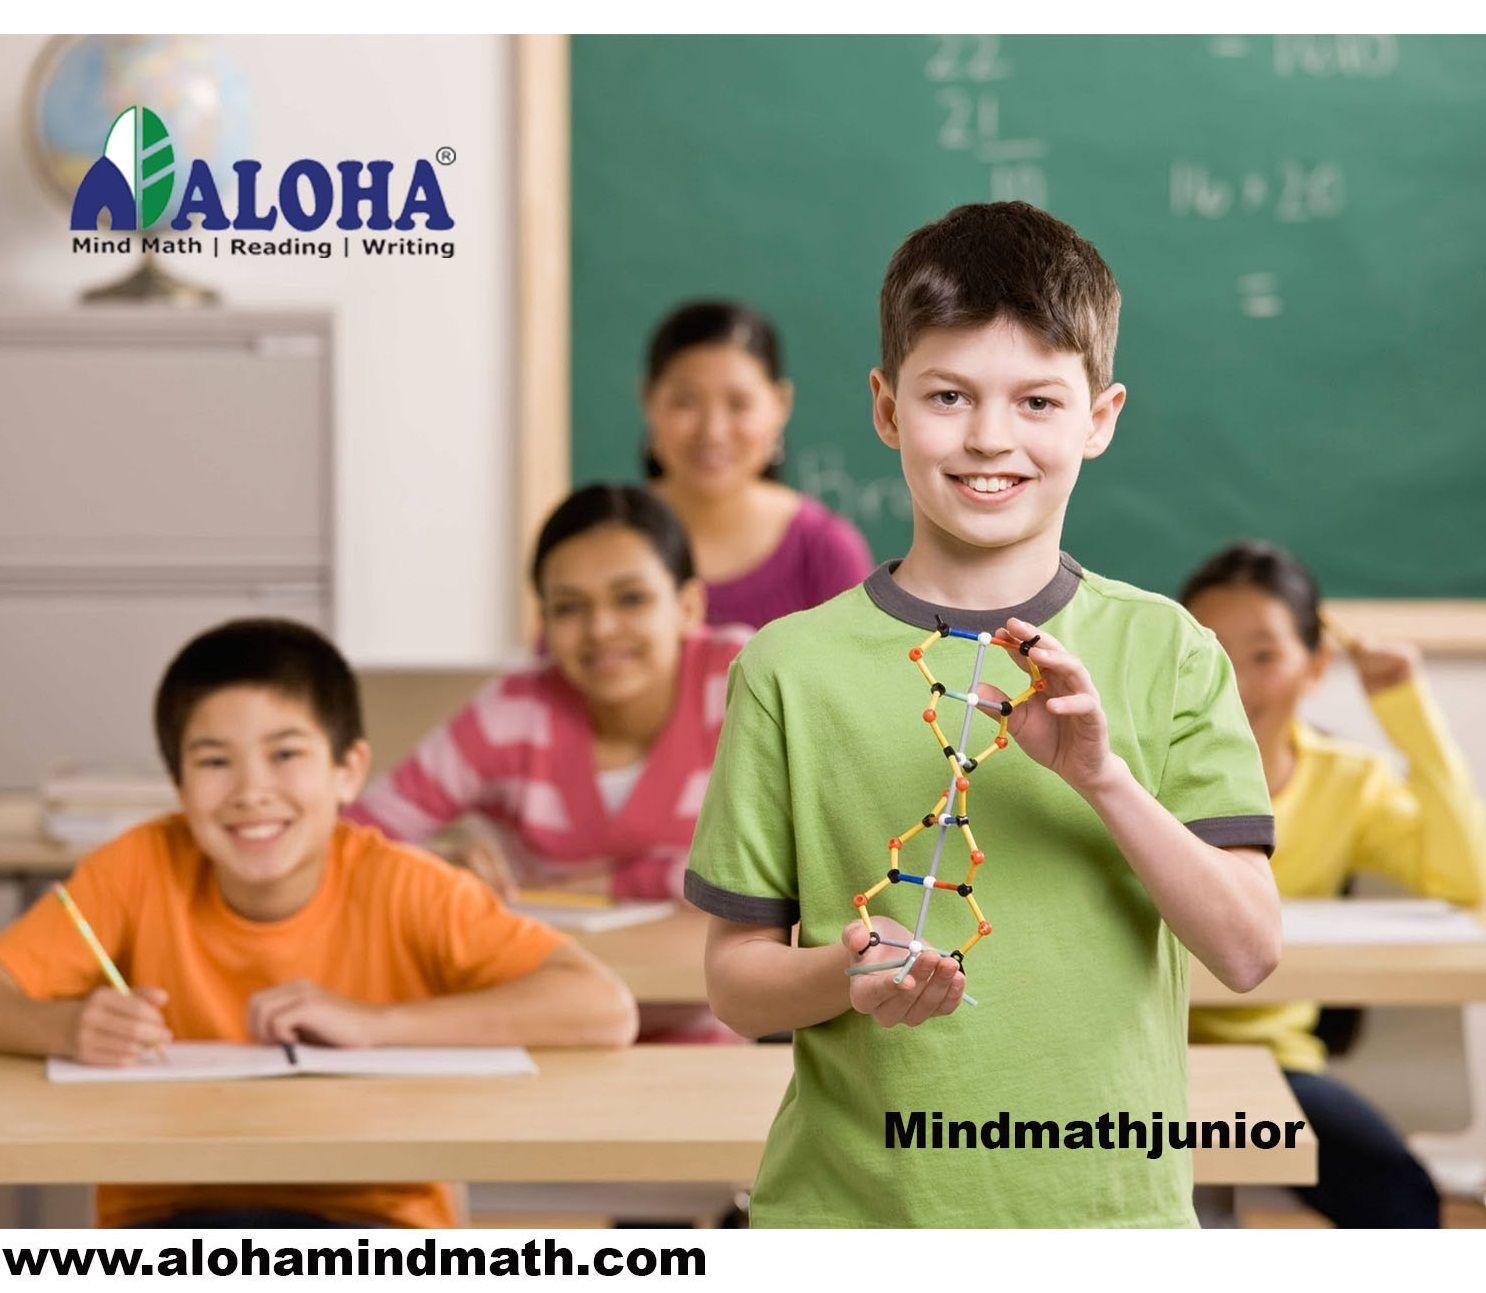 Aloha is a USA based Math Tutoring Center for Kids to teach ...